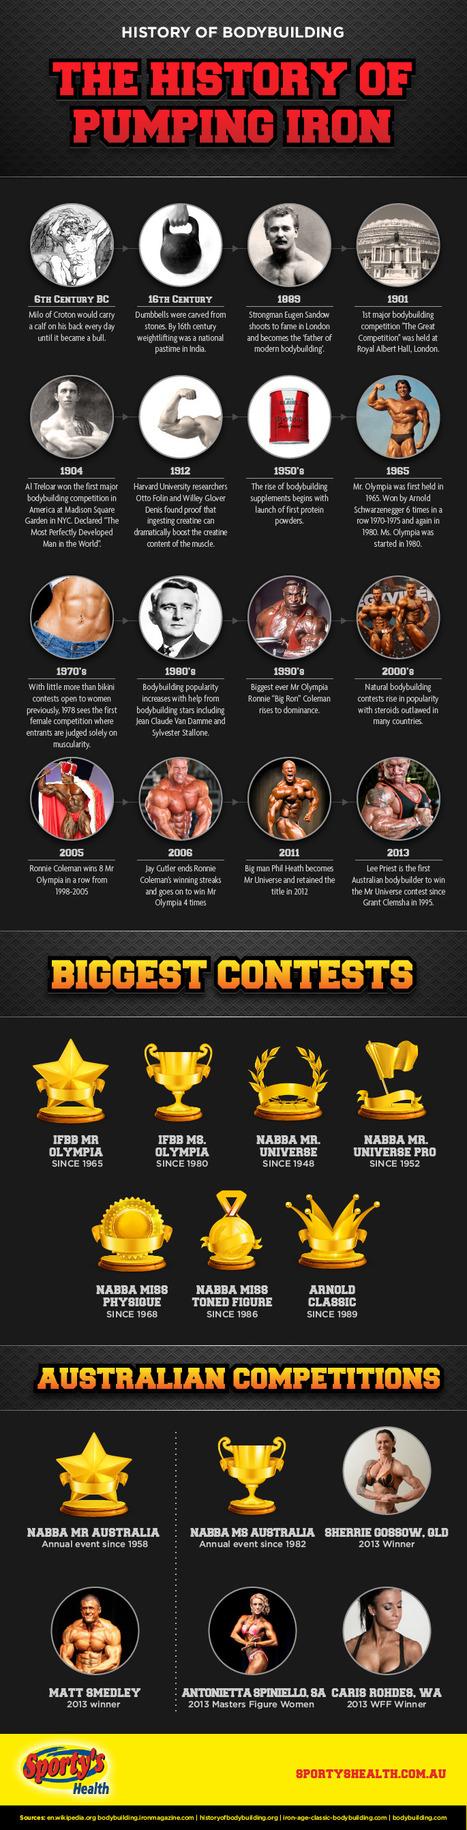 The History of Bodybuilding | Bodybuilding & Fitness | Scoop.it